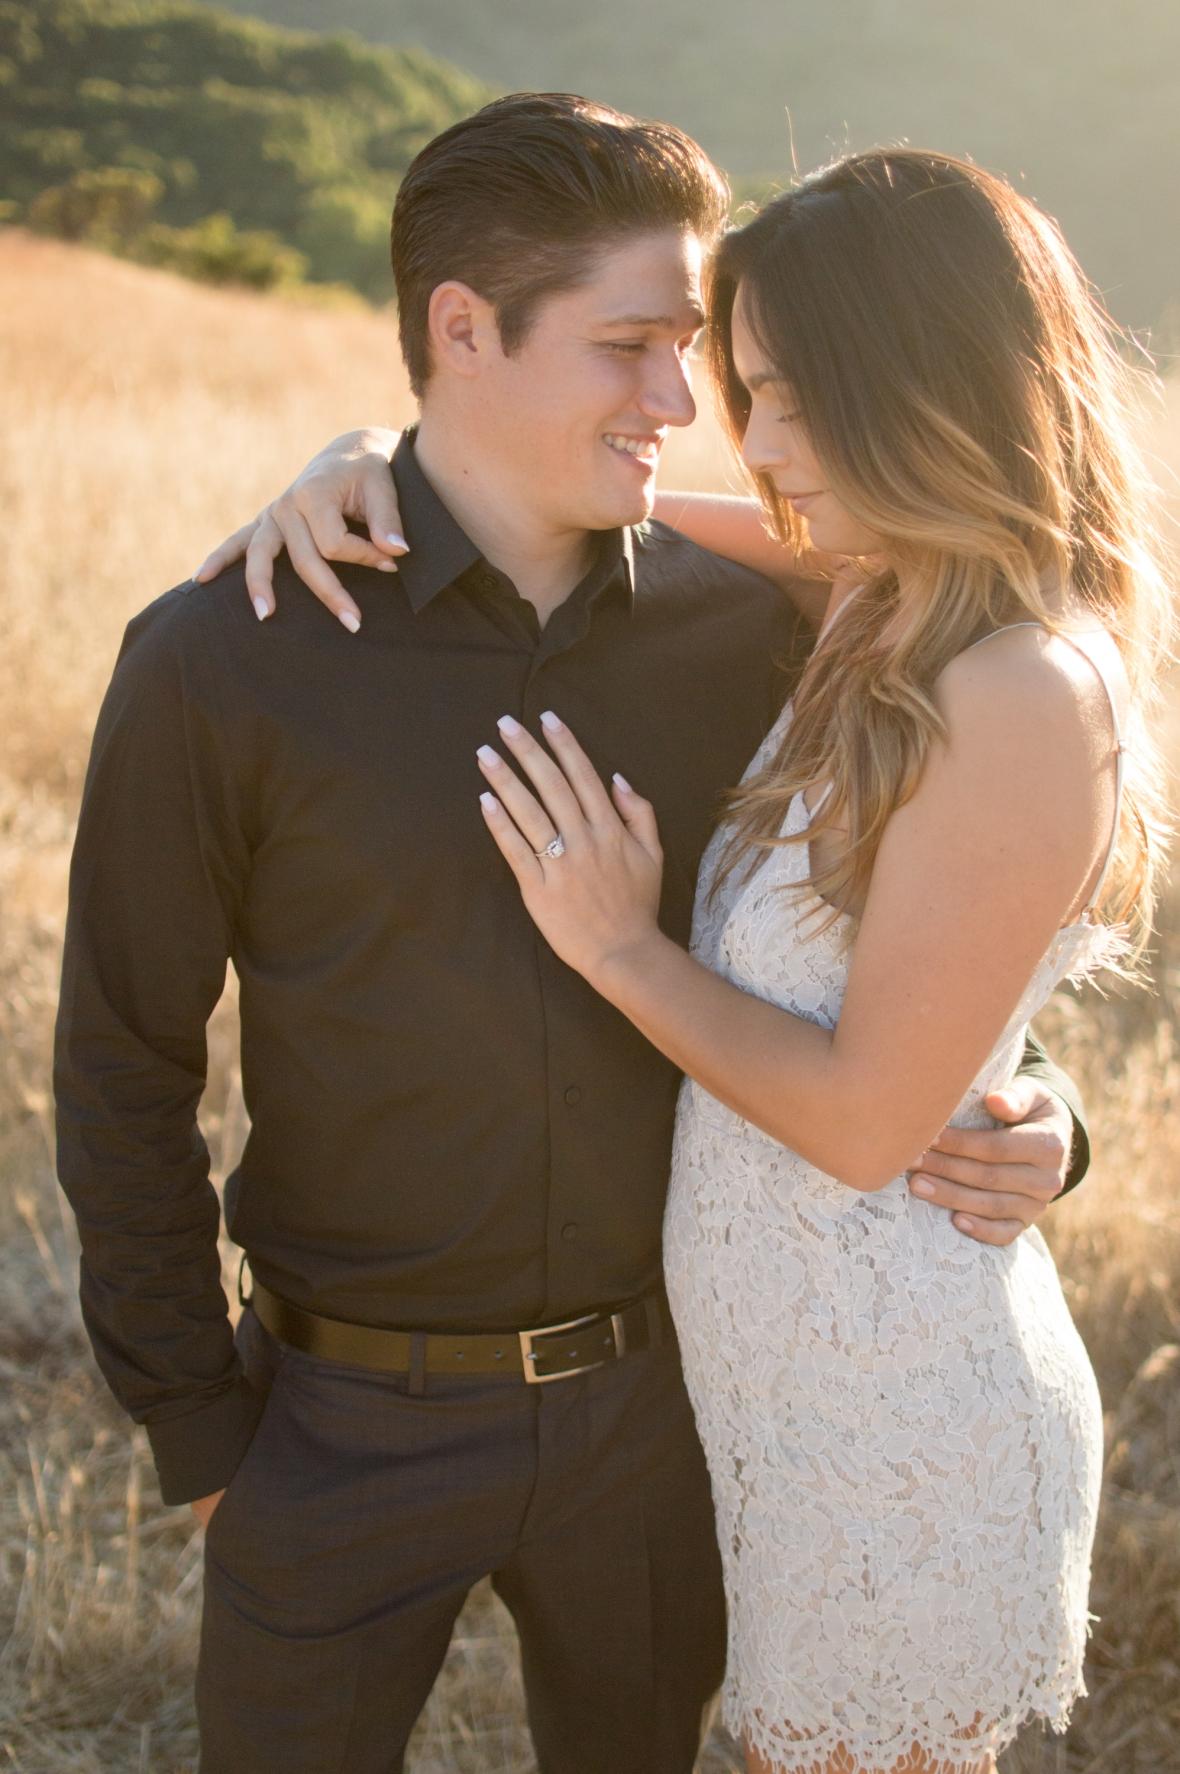 Quianna Marie Photography - Tony + Lindsay Engagement-27